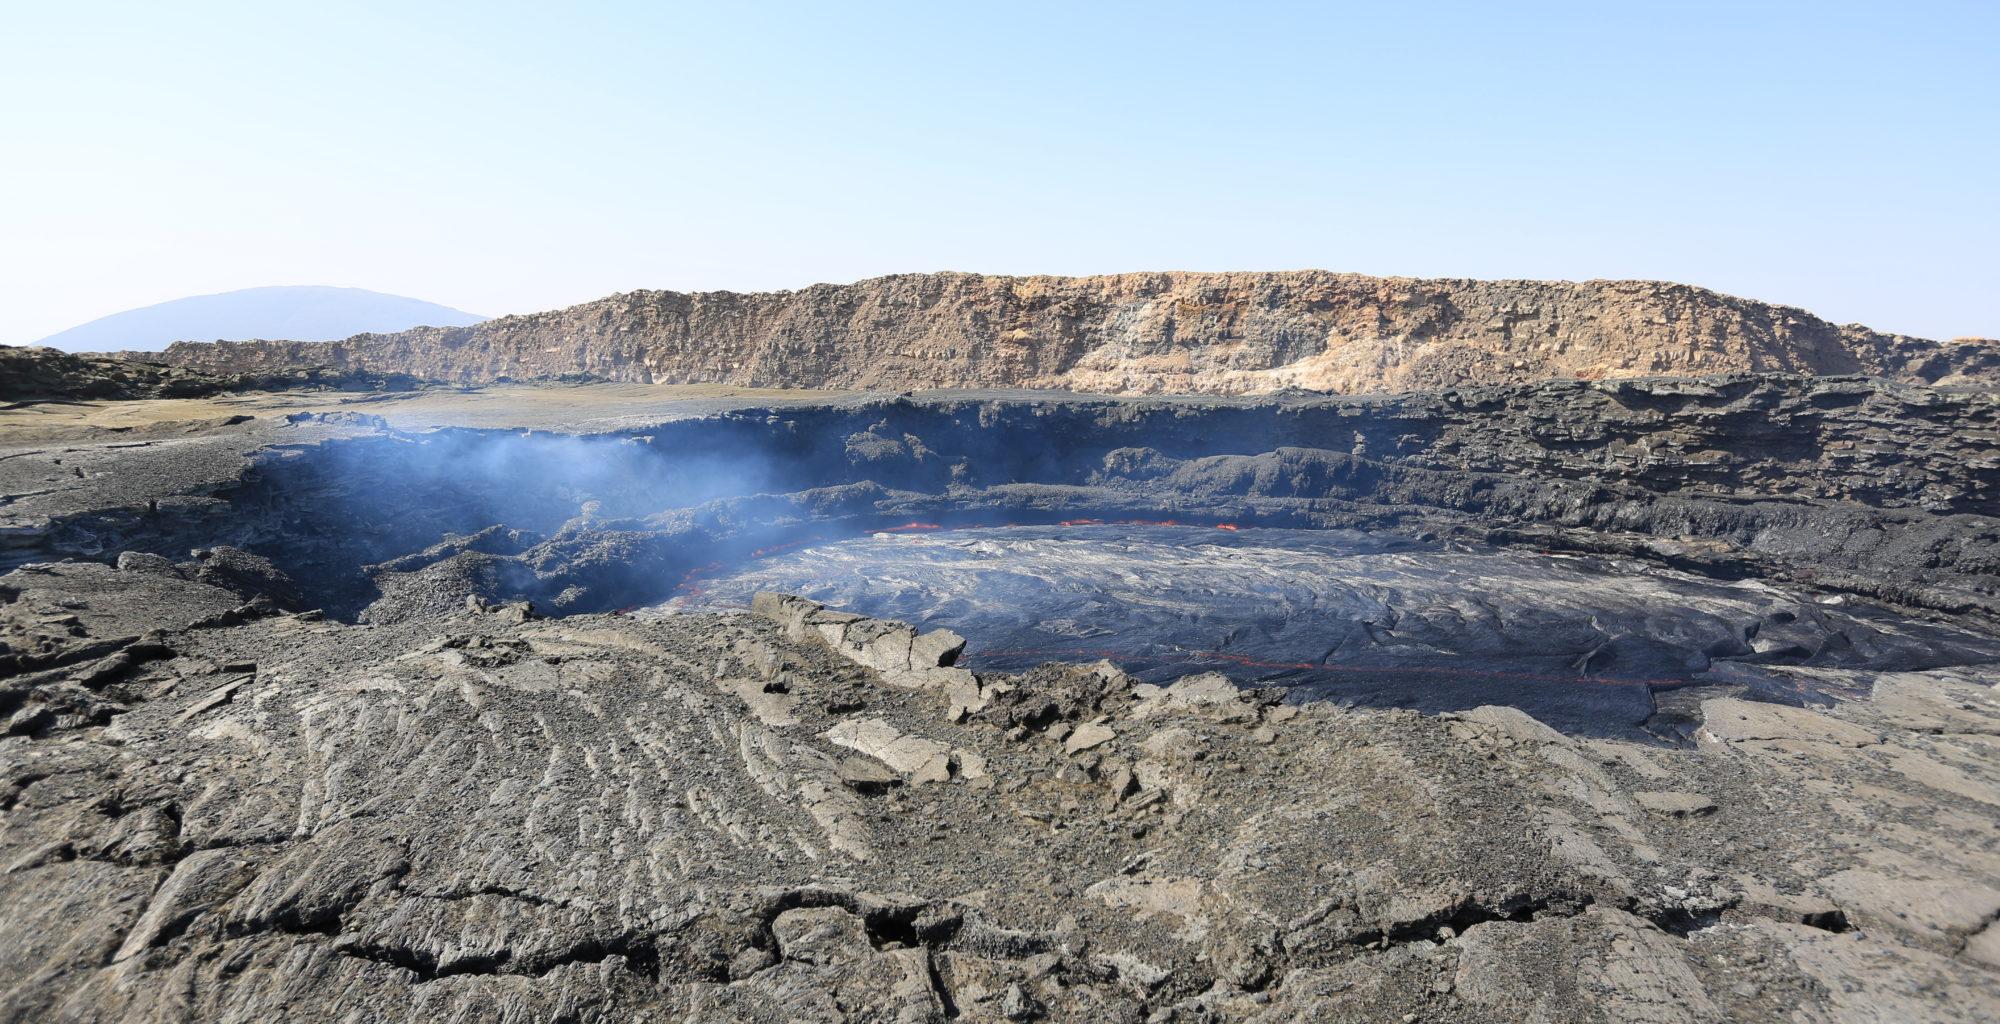 Ethiopia-Danakil-Depression-Landscape